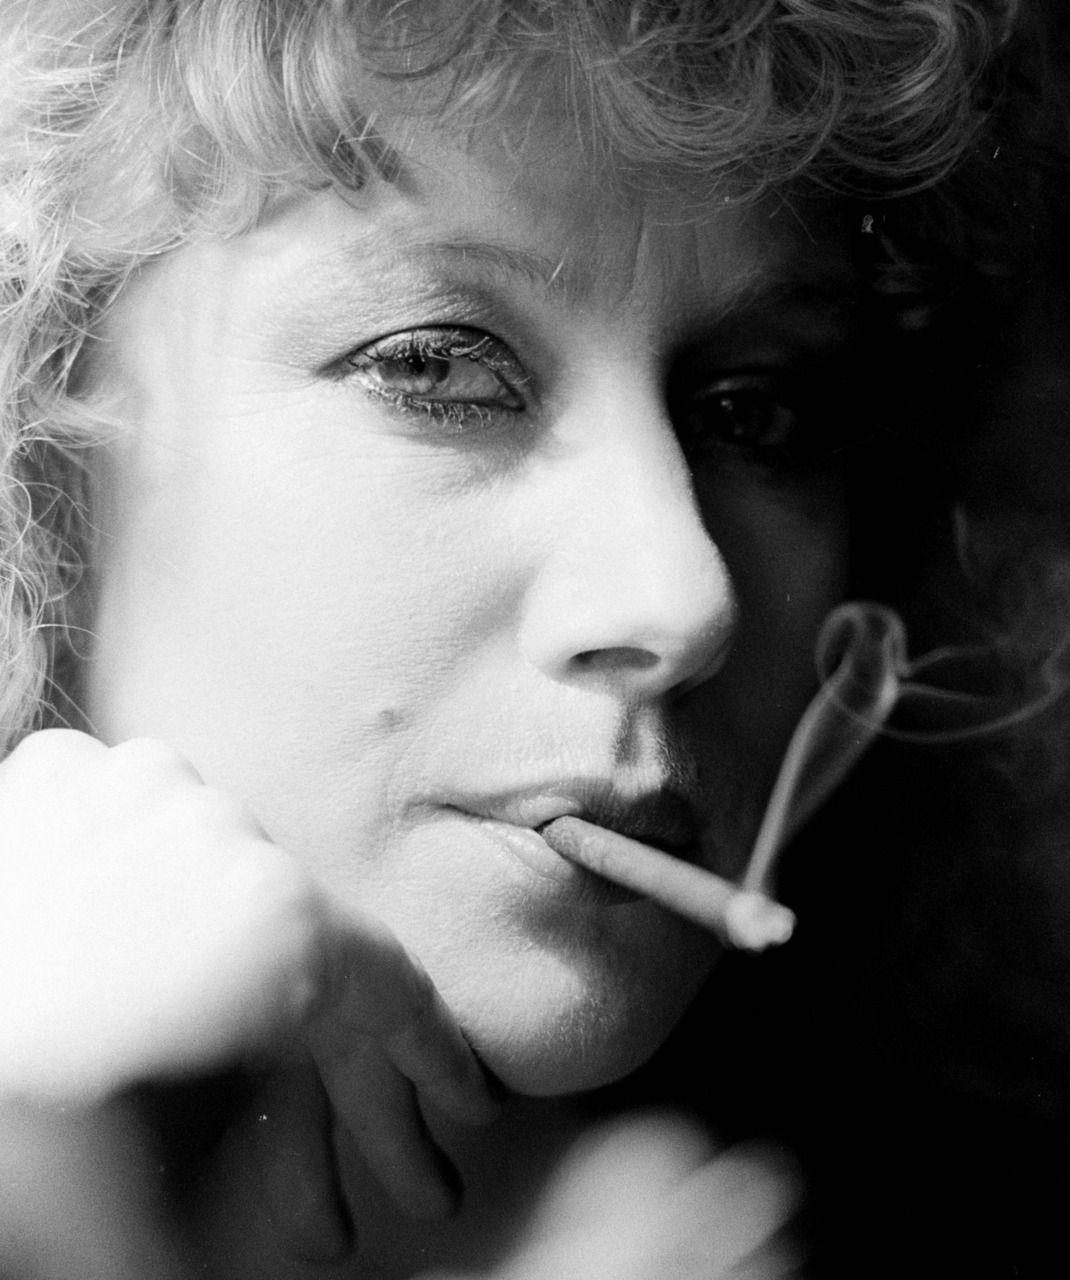 Cynthia Dale,Marsha Mason Porno pic Letizia Quaranta,Dawn French (born 1957)